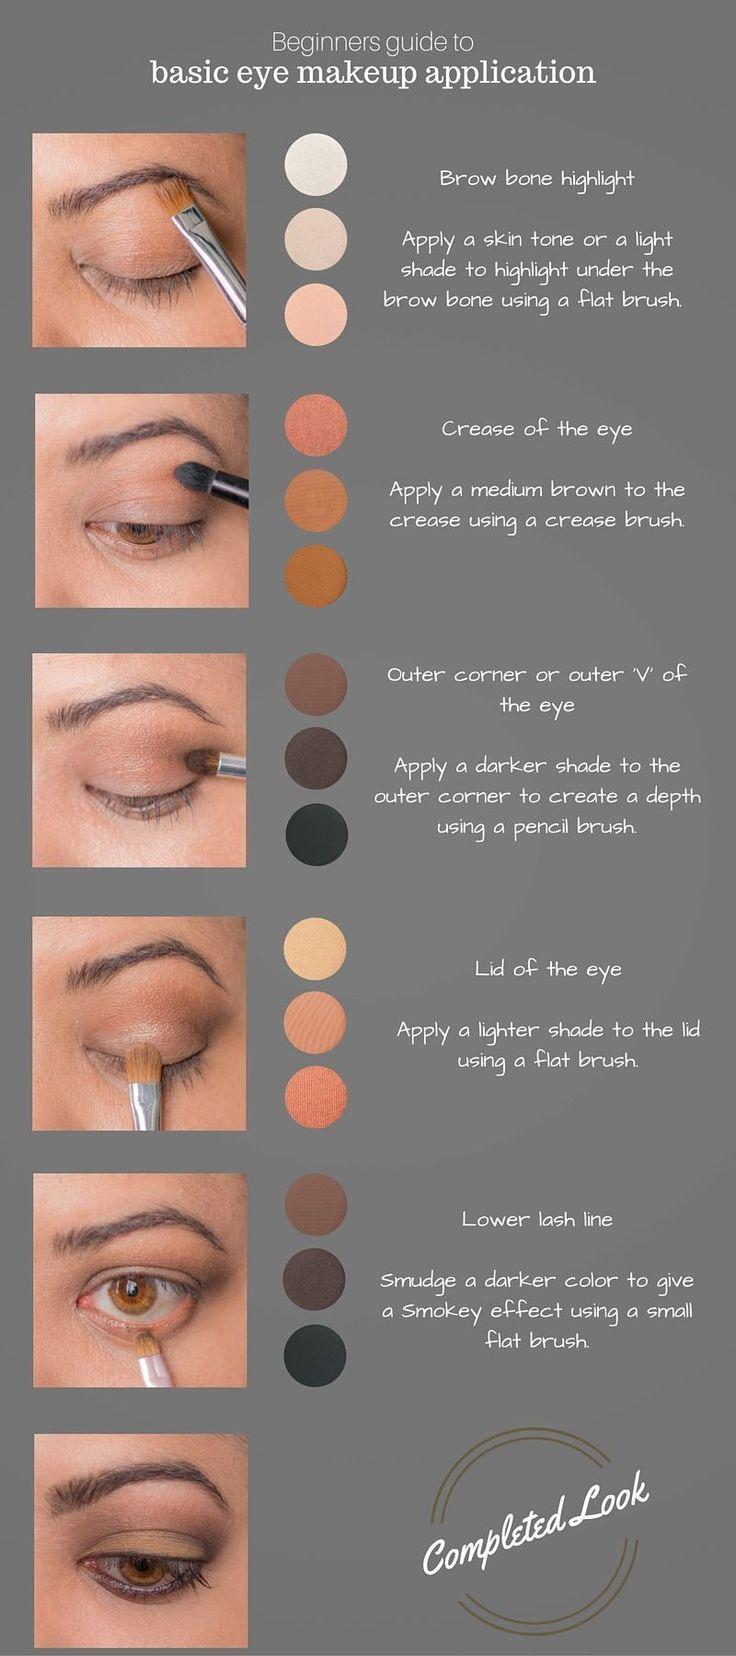 Smokey Eye Makeup For Dummies in 2020 Beginners eye